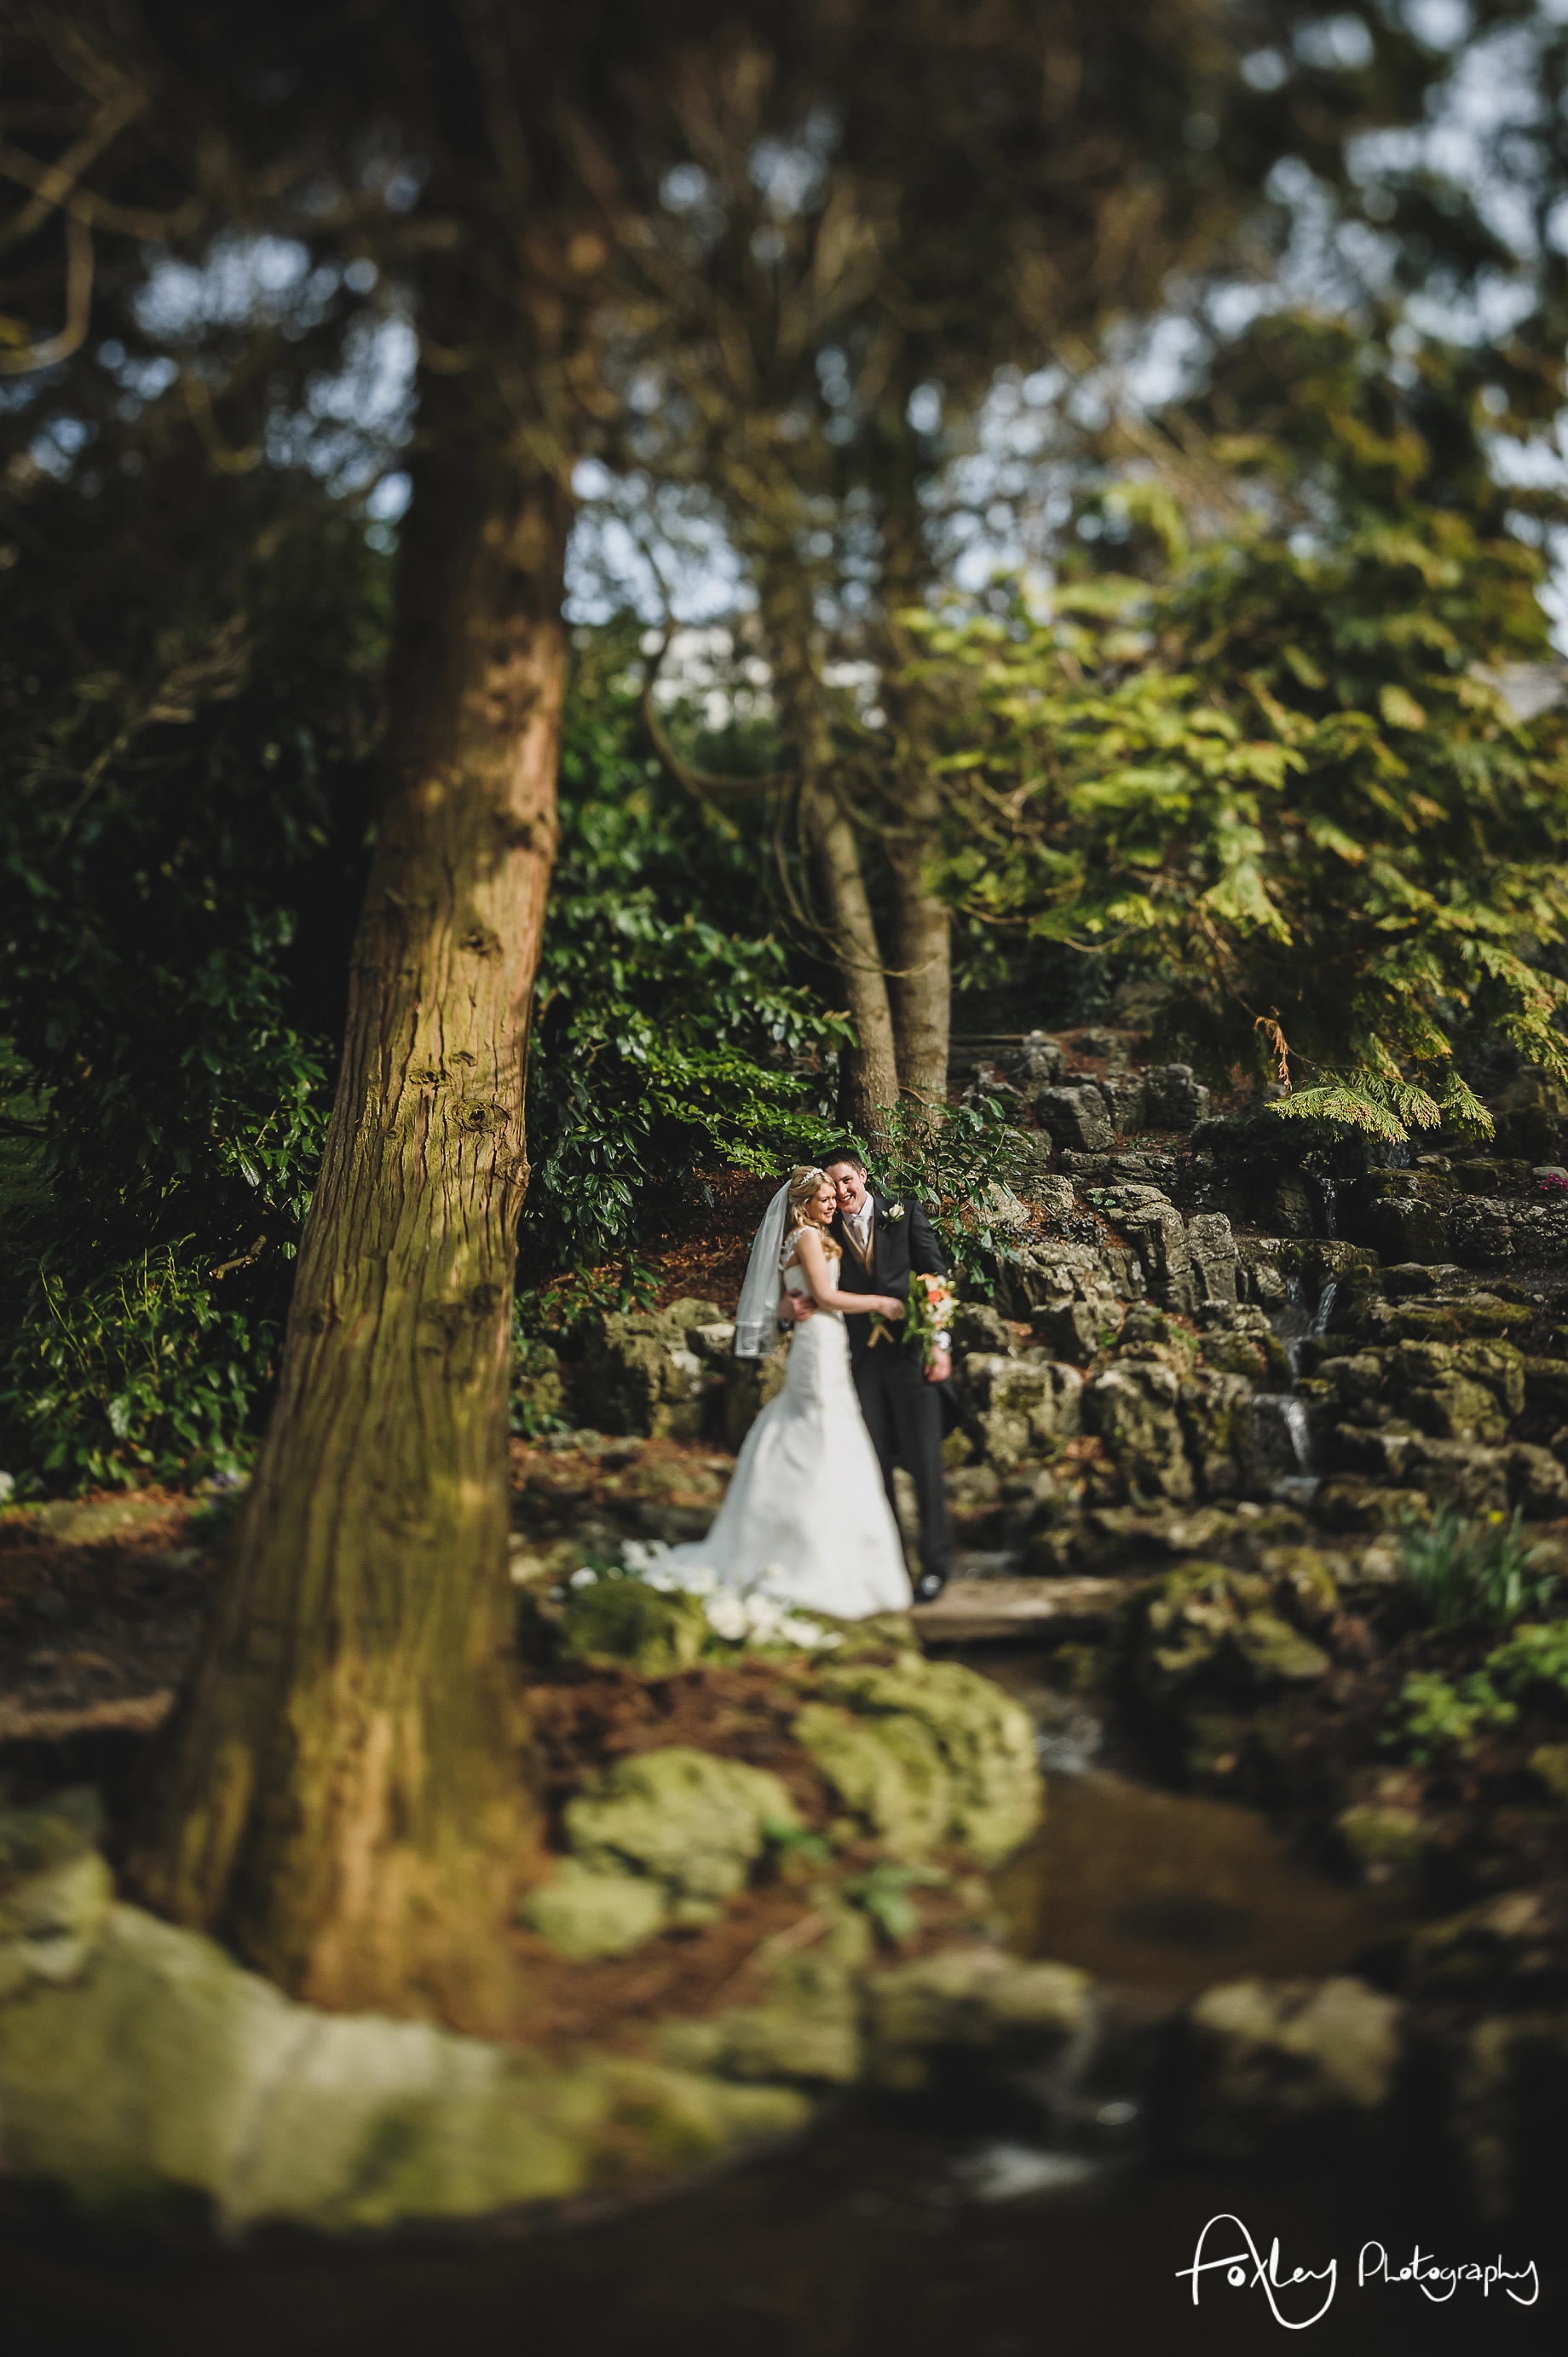 Gemma and Lewis' Wedding at Mitton Hall 112